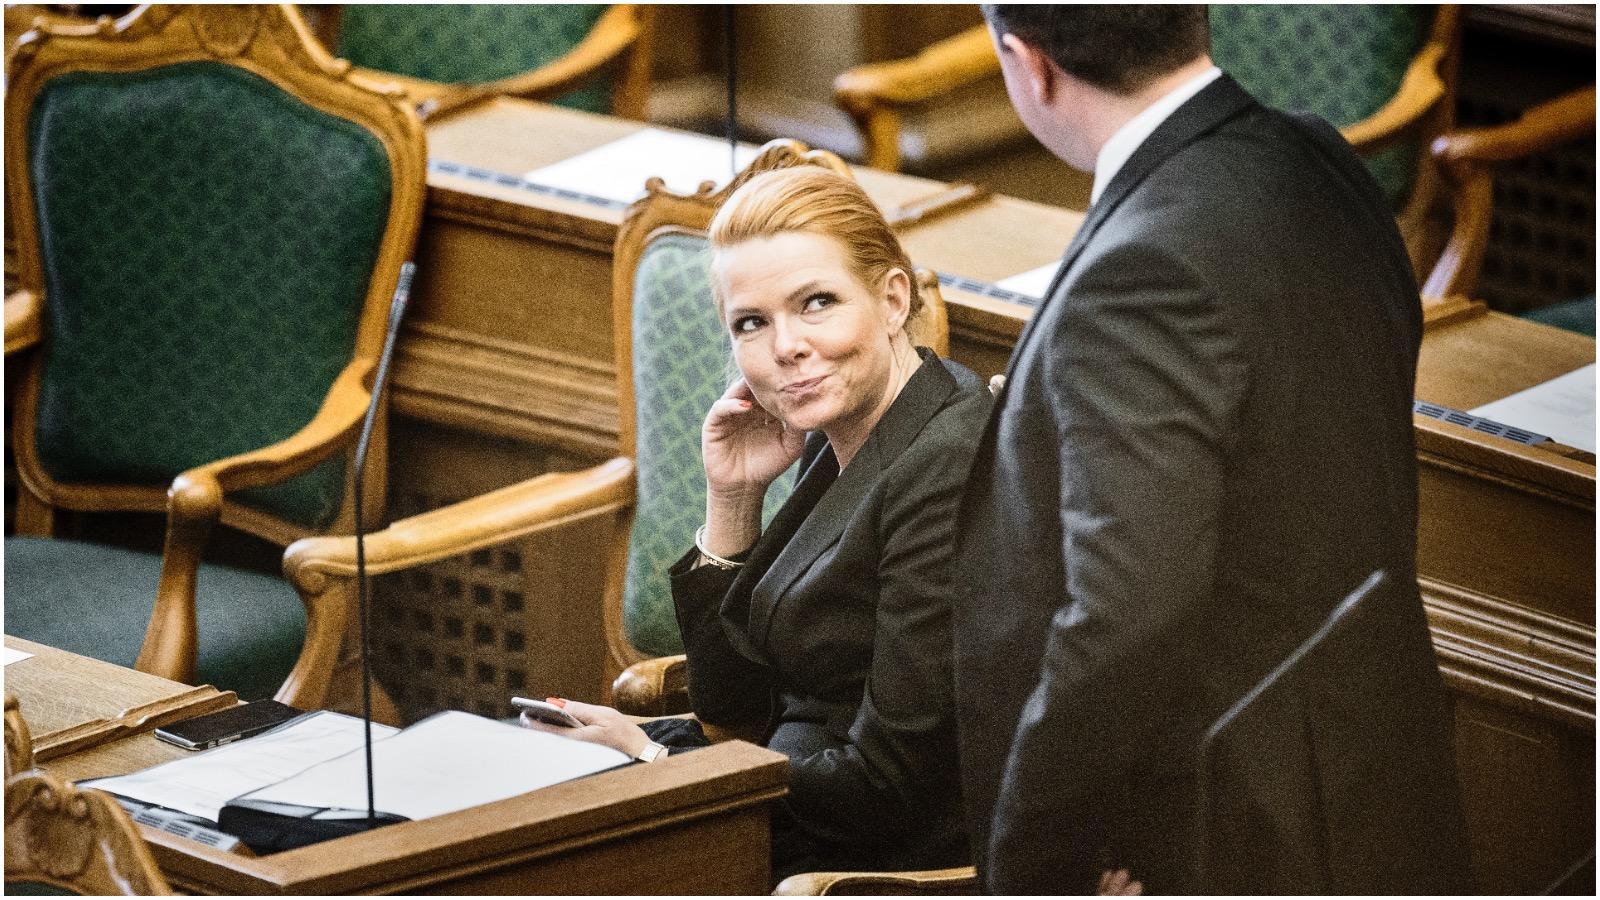 Simon Pihl Sørensen (S): Lov om håndtryk er udtryk for totalitær tænkning